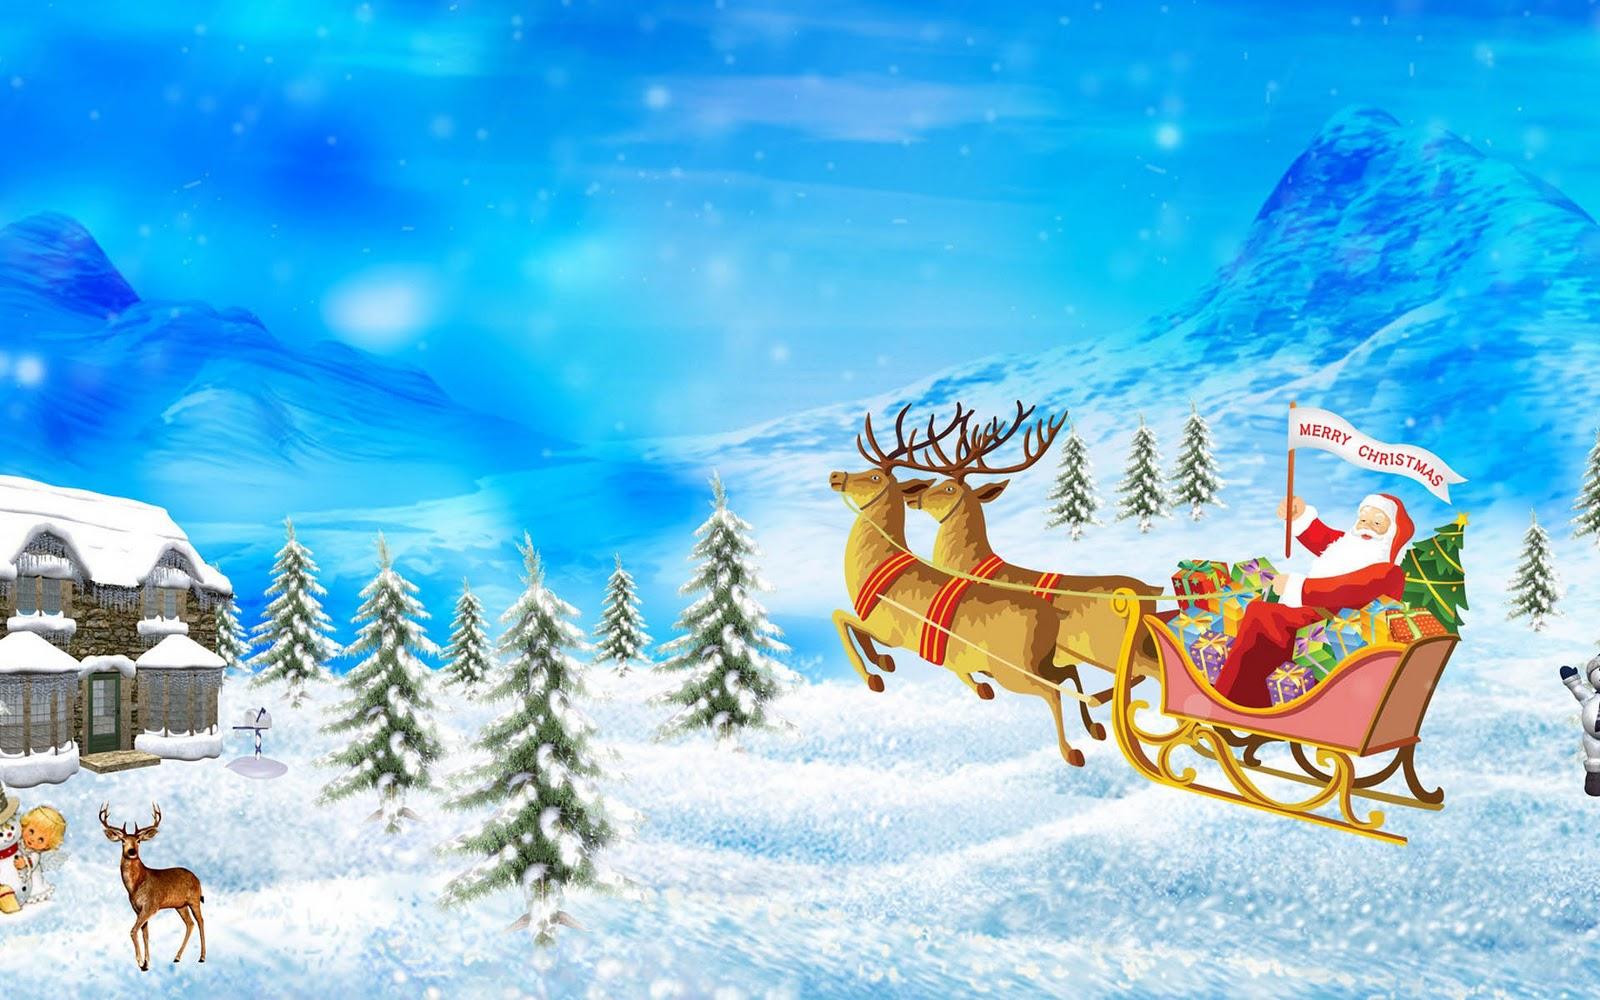 http://2.bp.blogspot.com/-yLPI0YWL4ns/Tq_SusdZN0I/AAAAAAAAP1Y/0SxUhfsSkbE/s1600/Mooie-kerstman-achtergronden-leuke-kerstman-wallpapers-afbeelding-plaatje-foto-7.jpg